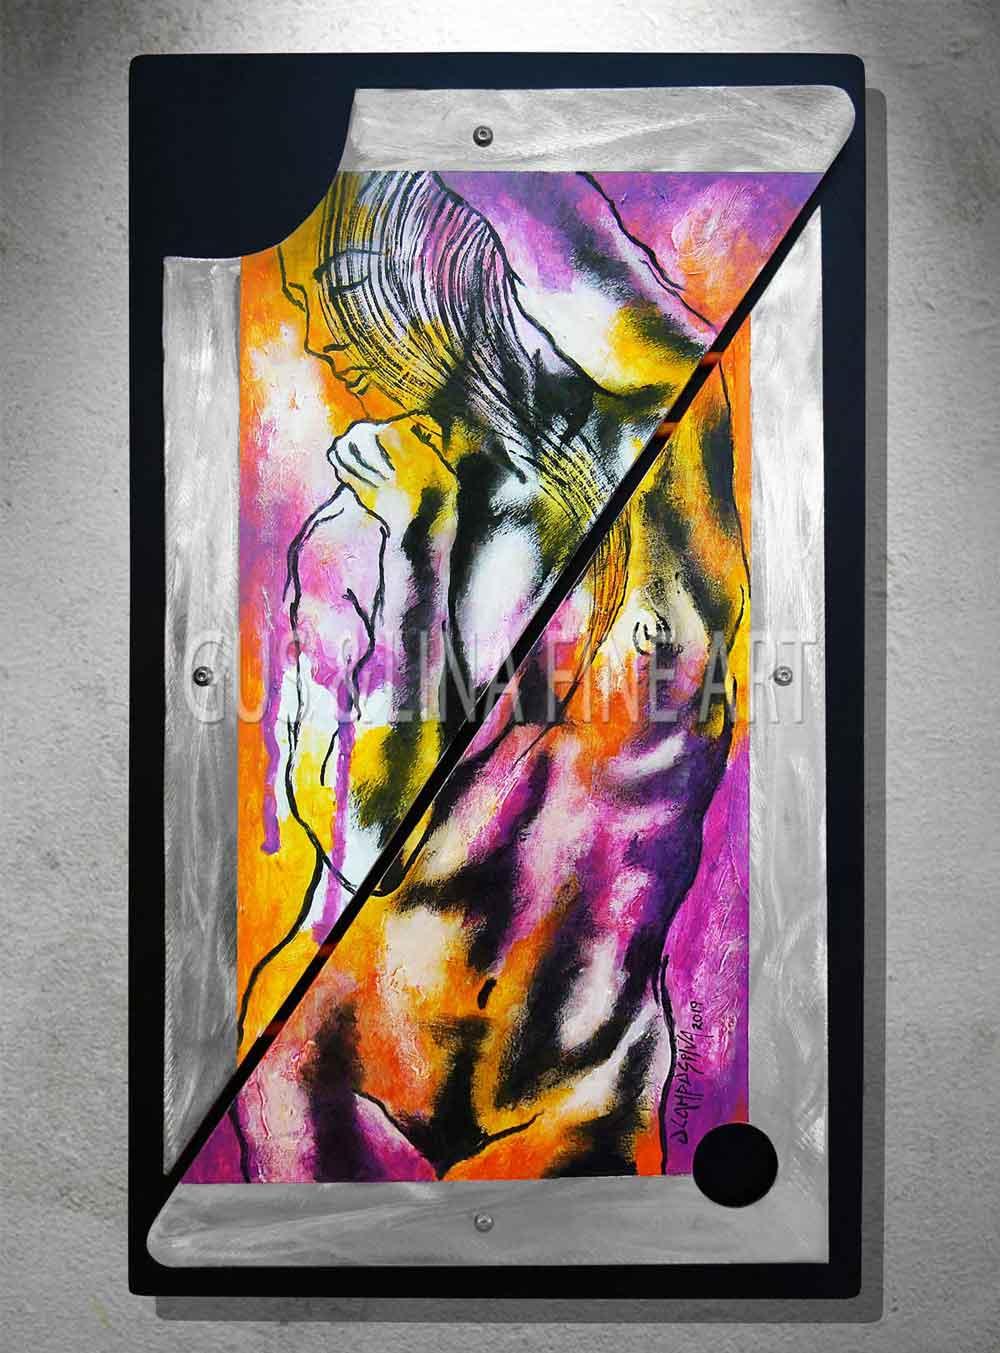 Female Body - Nude